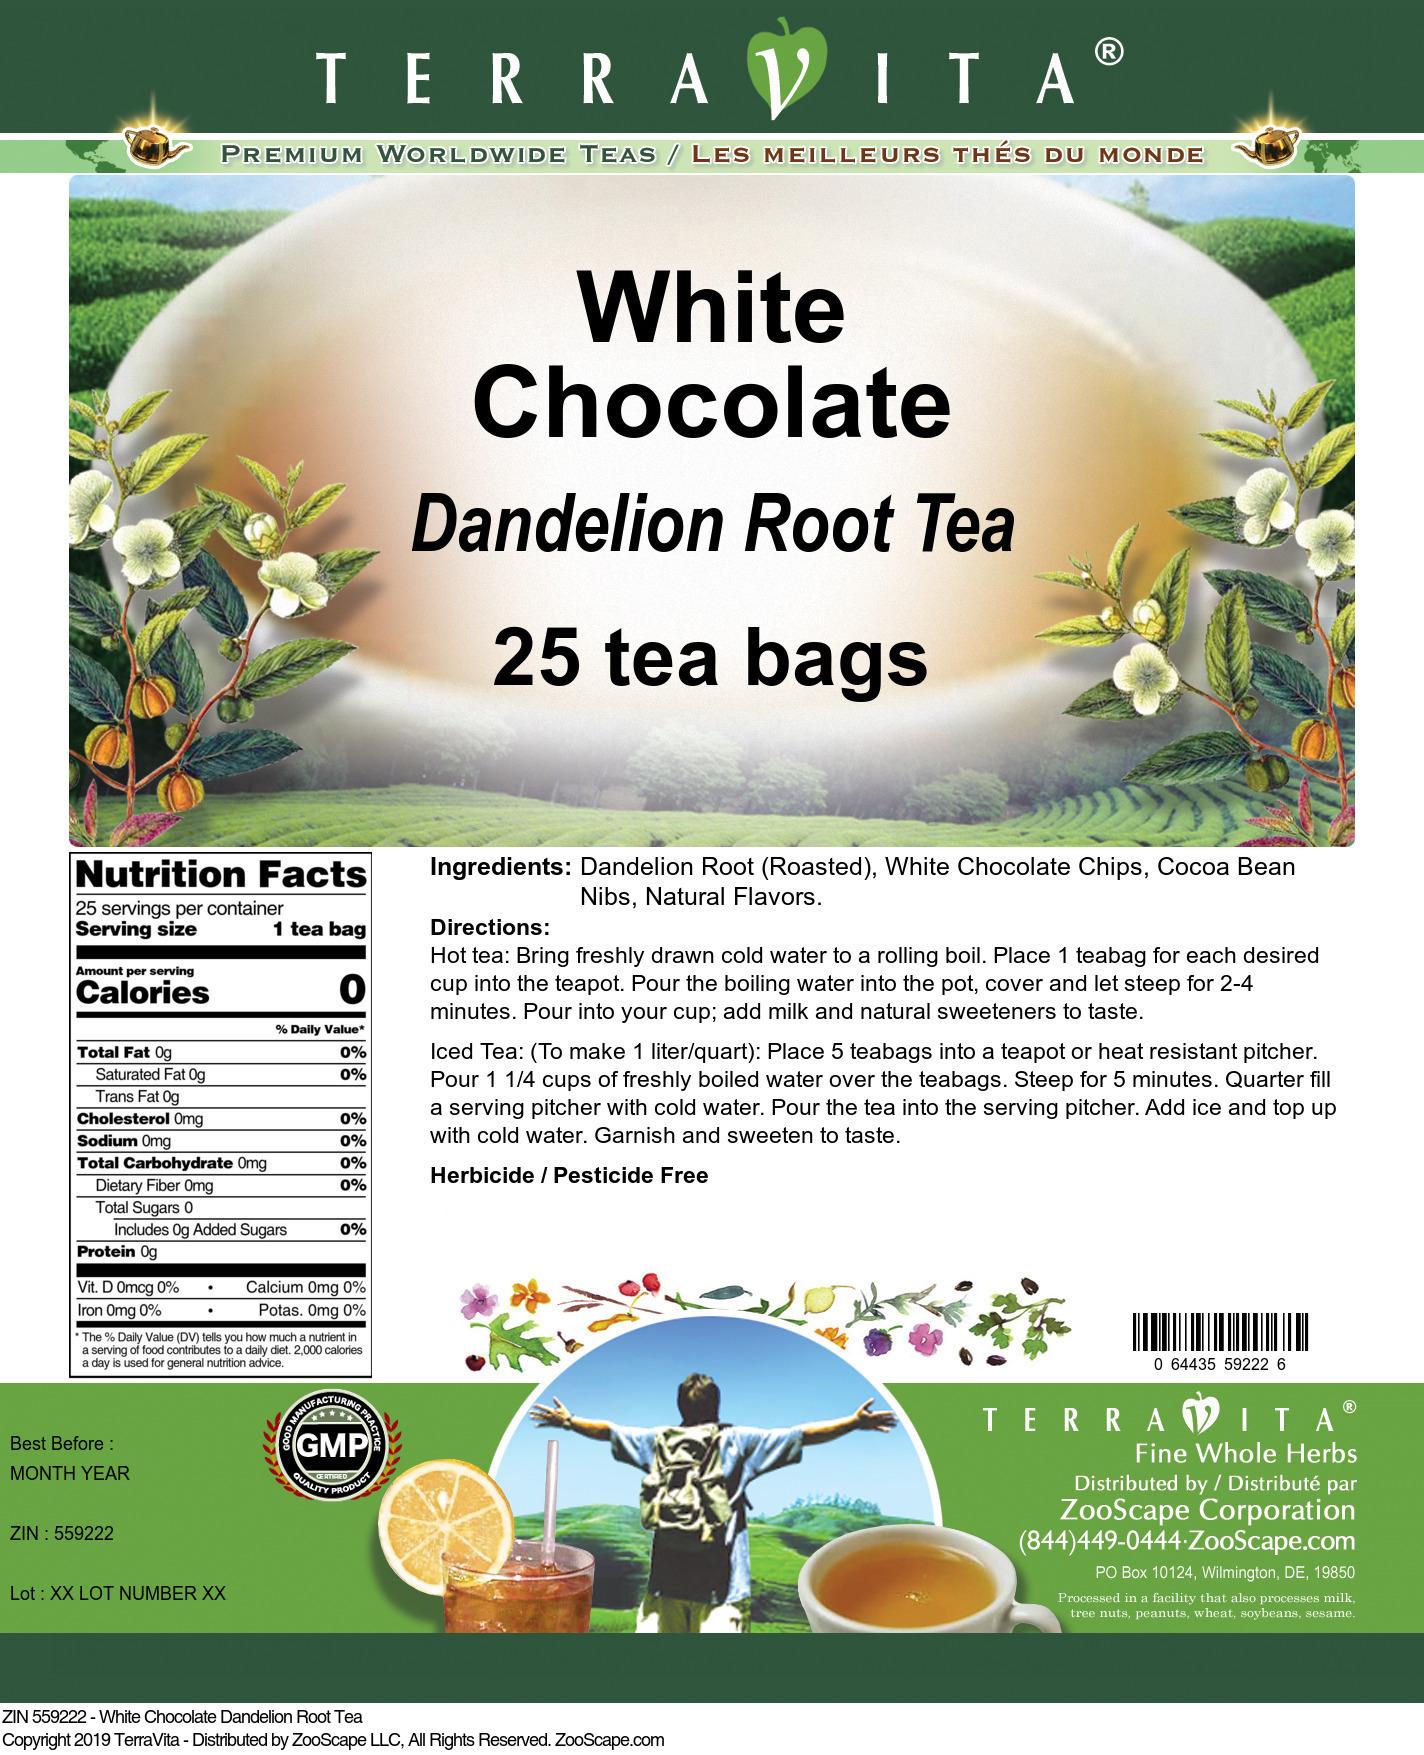 White Chocolate Dandelion Root